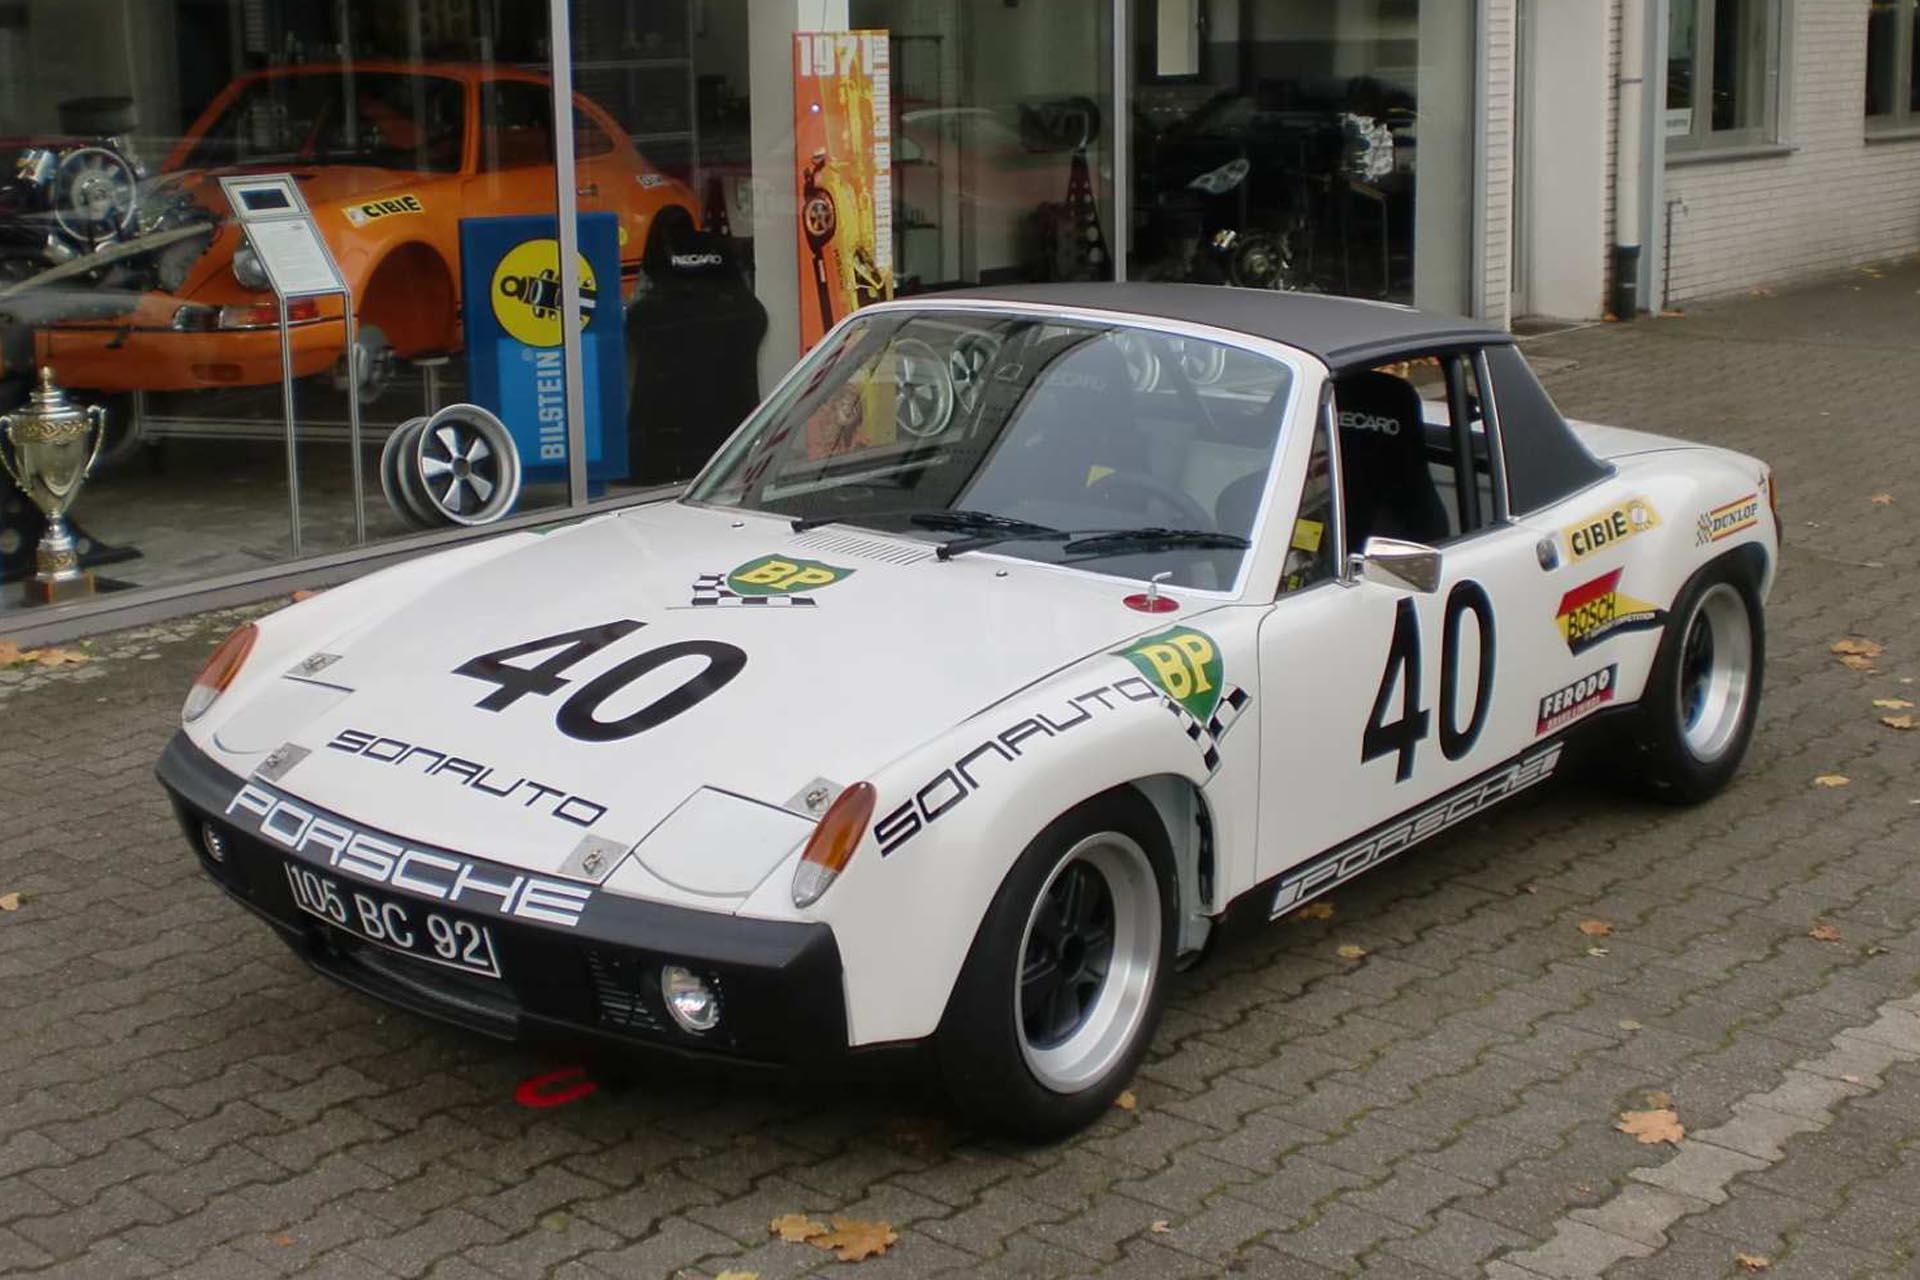 914/6 GT Nachbau des berühmten 24h von Le Mans #40